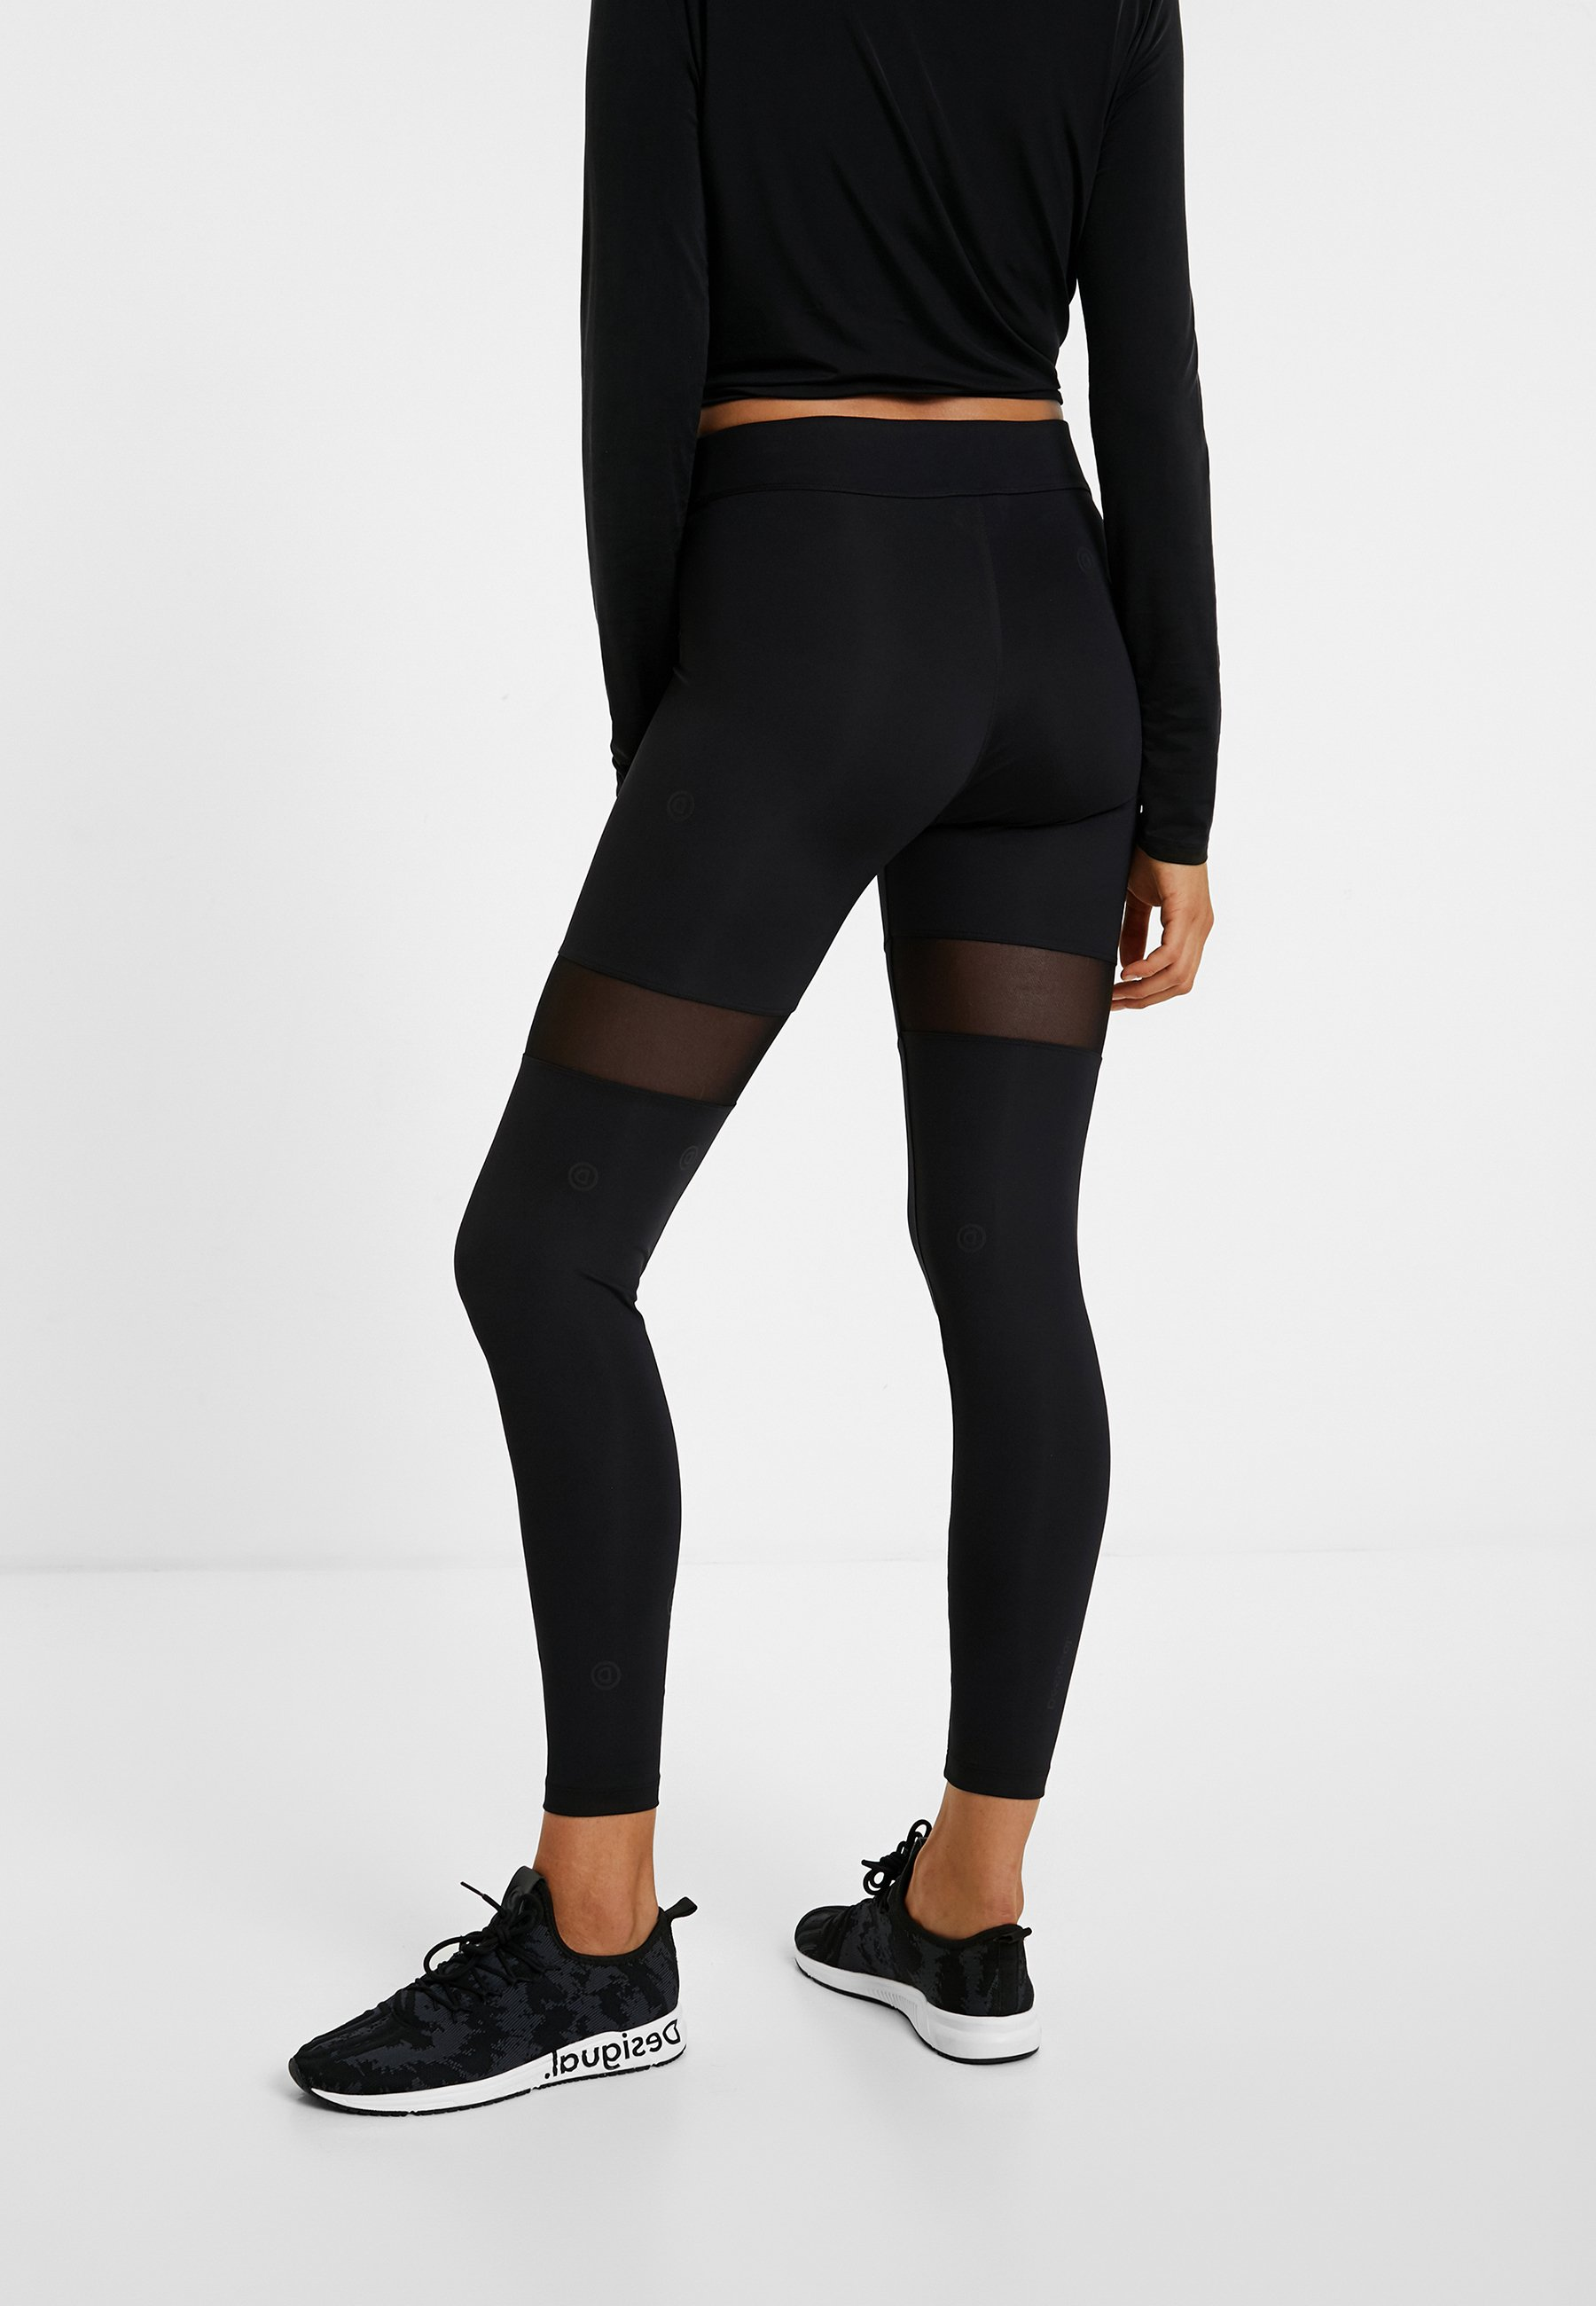 Desigual RIÑO - Legging - black XayLG2wi